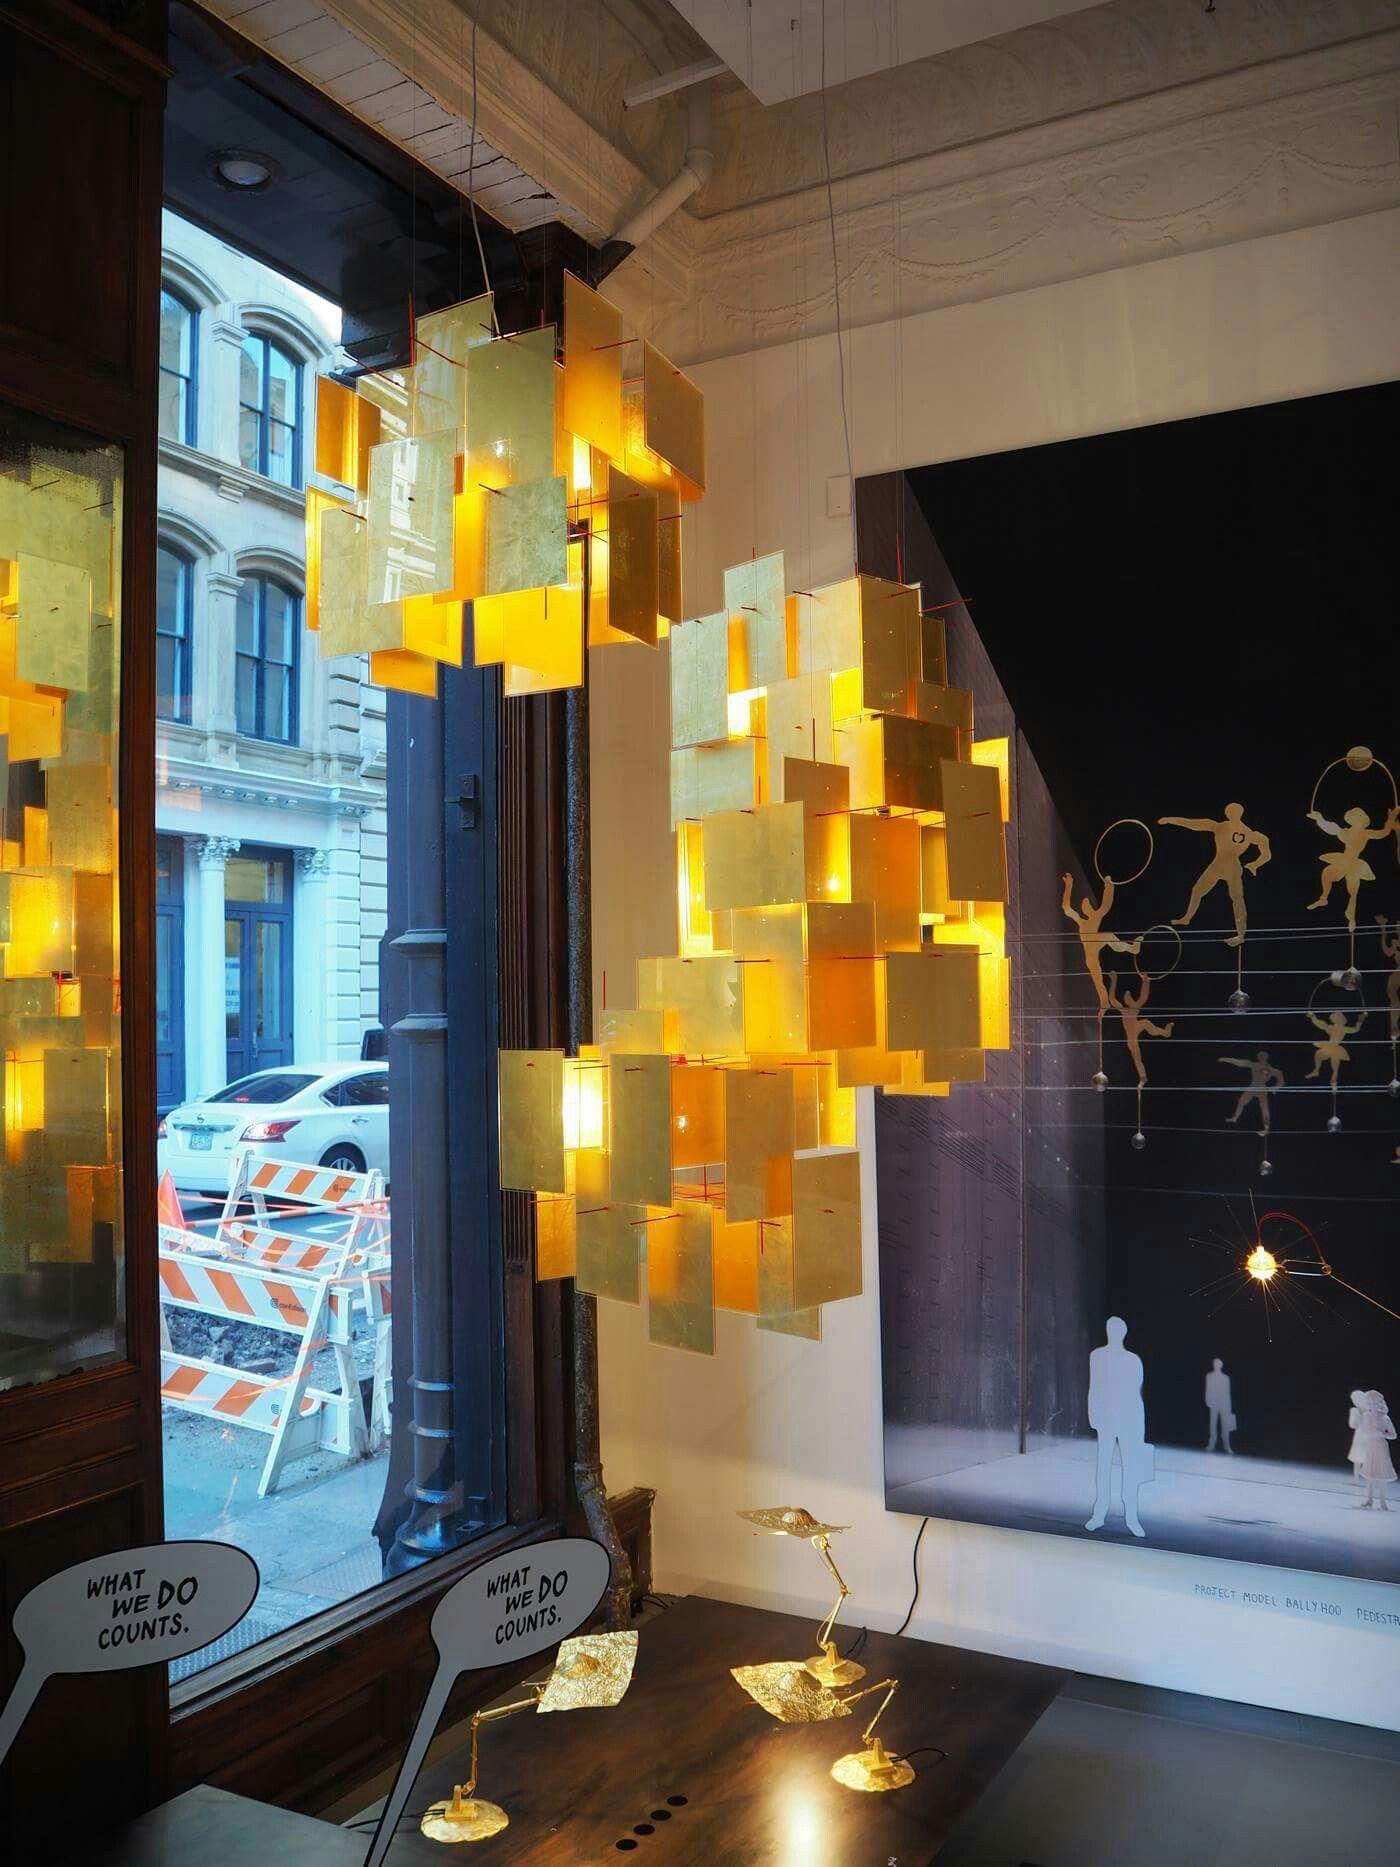 Pin by natasha van willigen on lights pinterest lights